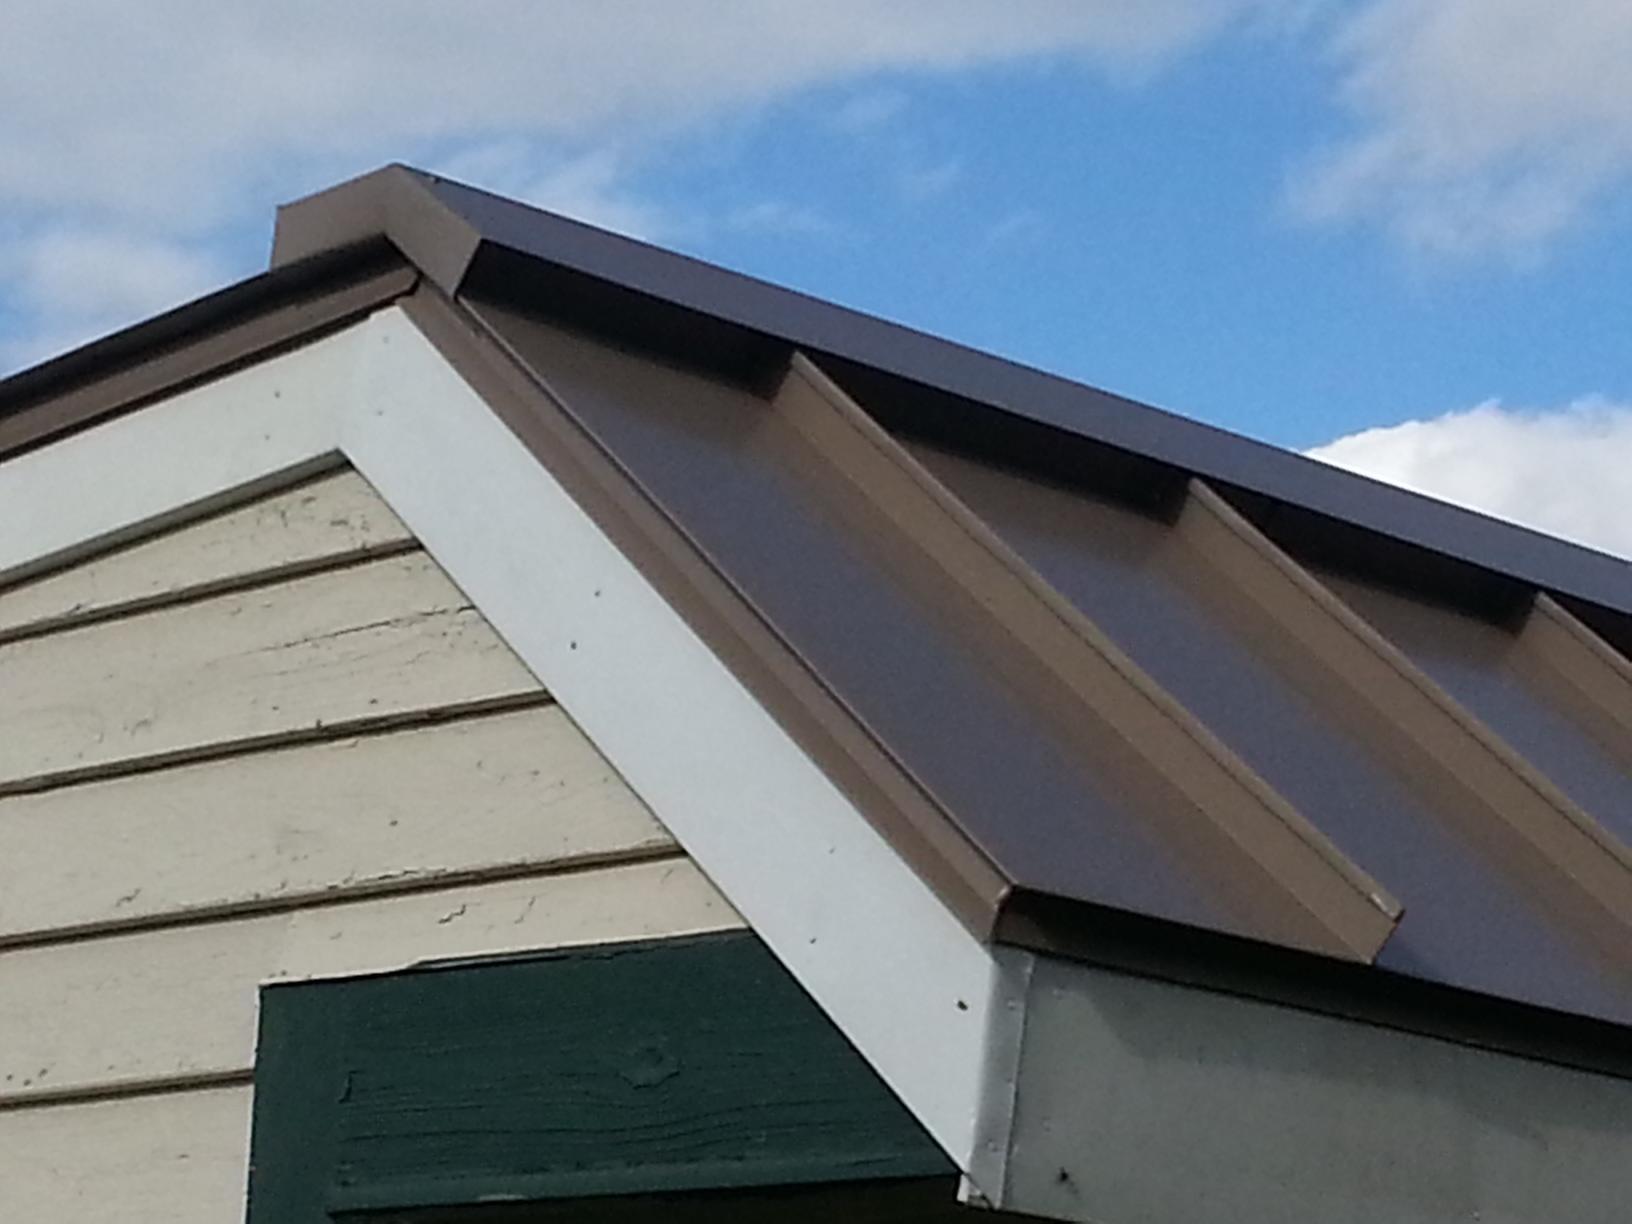 Buckskin G-Tech Standing Seam Metal Roof Installation in NJ